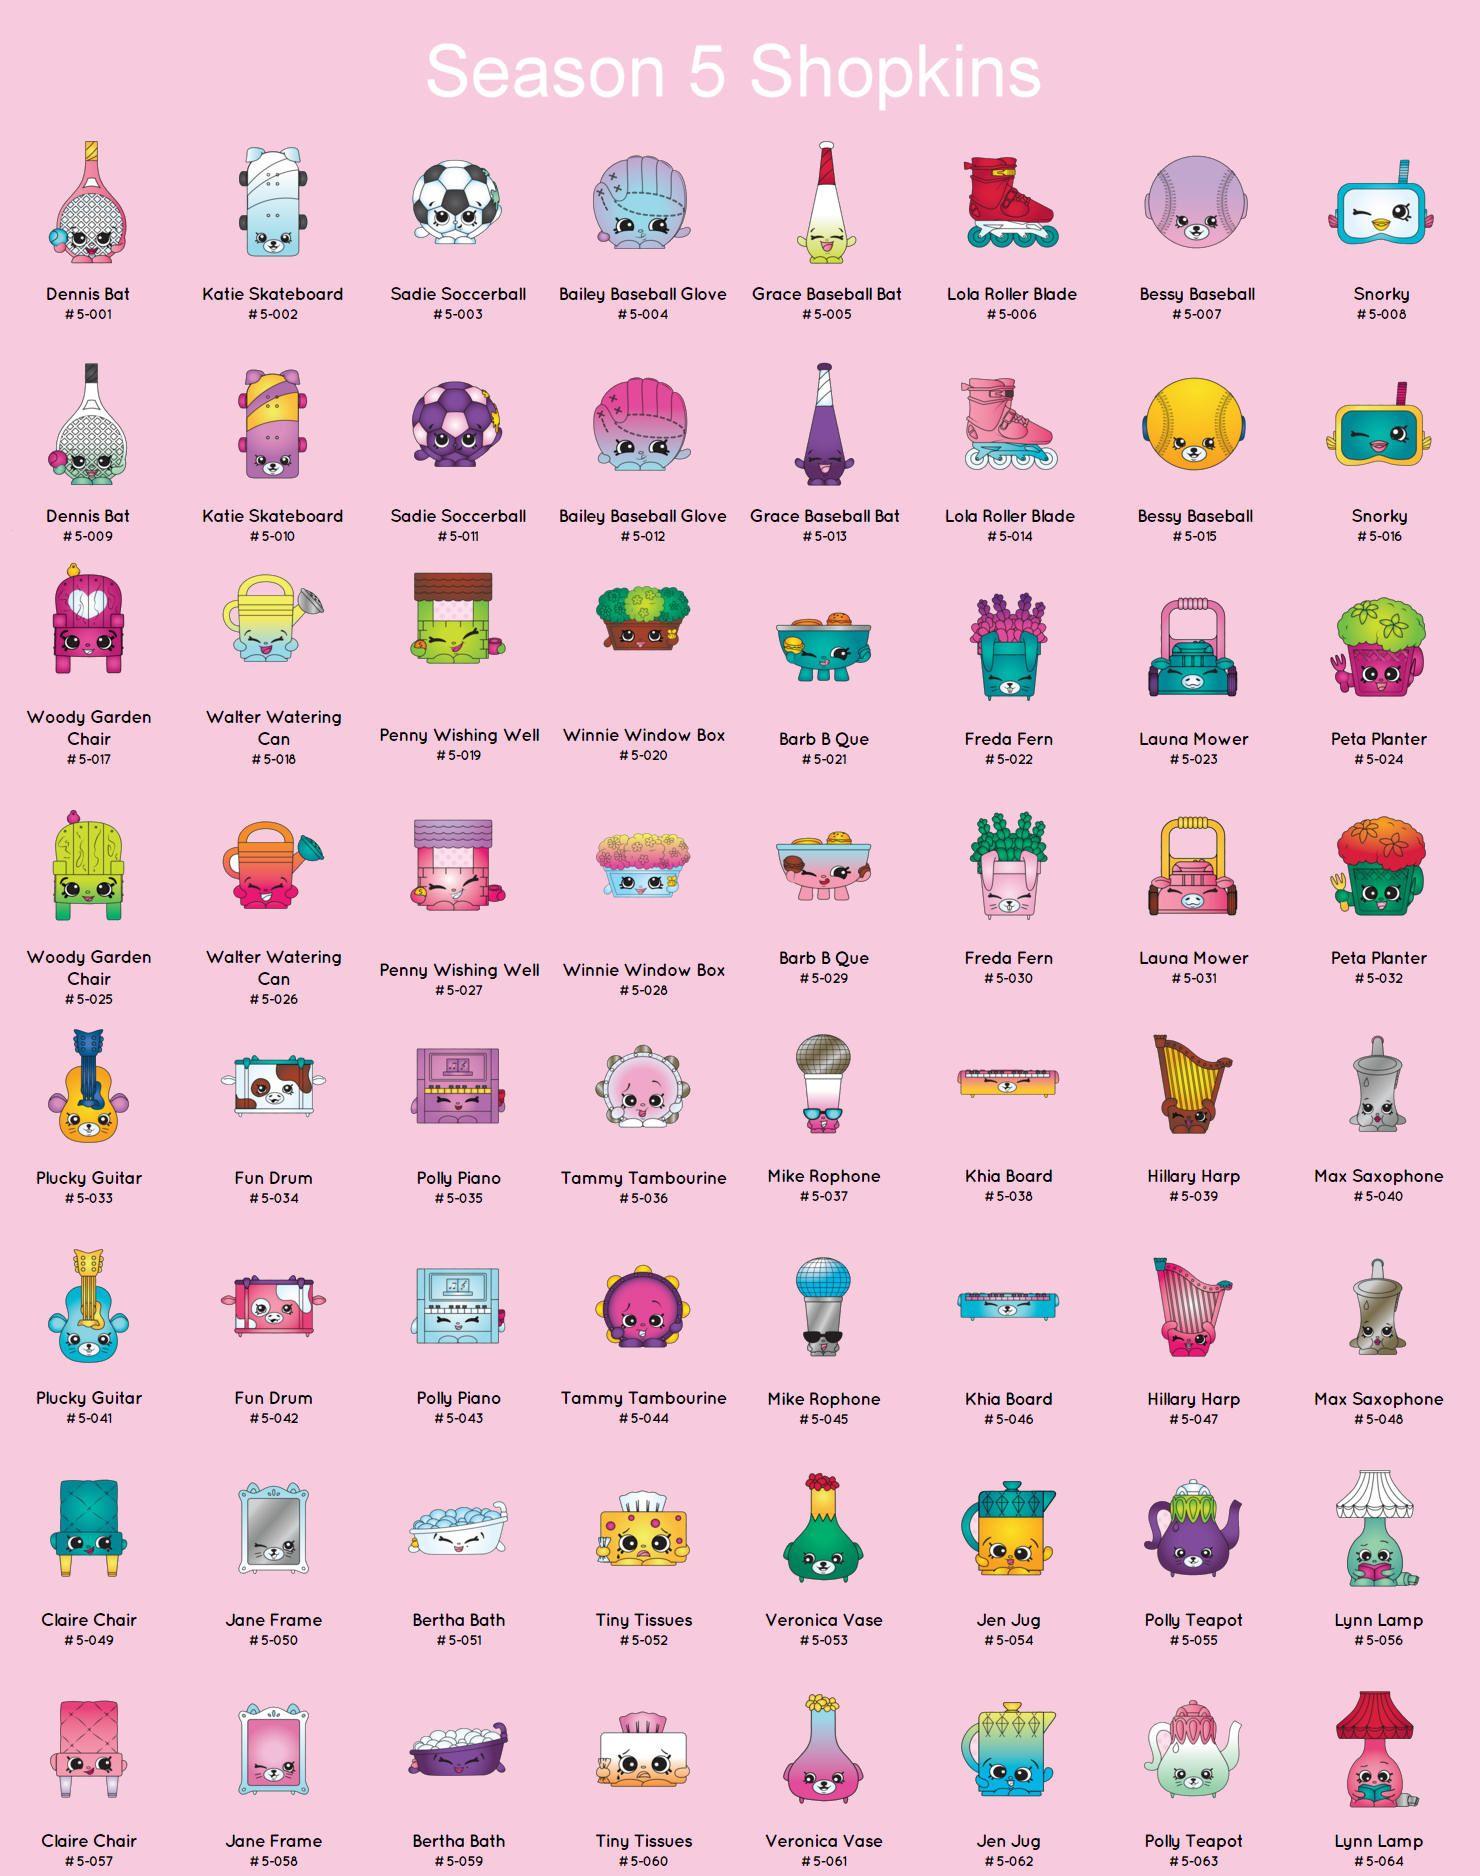 Squish Delish Names : Shopkins Season 5 Printable Full List Party Ideas Pinterest Shopkins, Shopkins season and ...